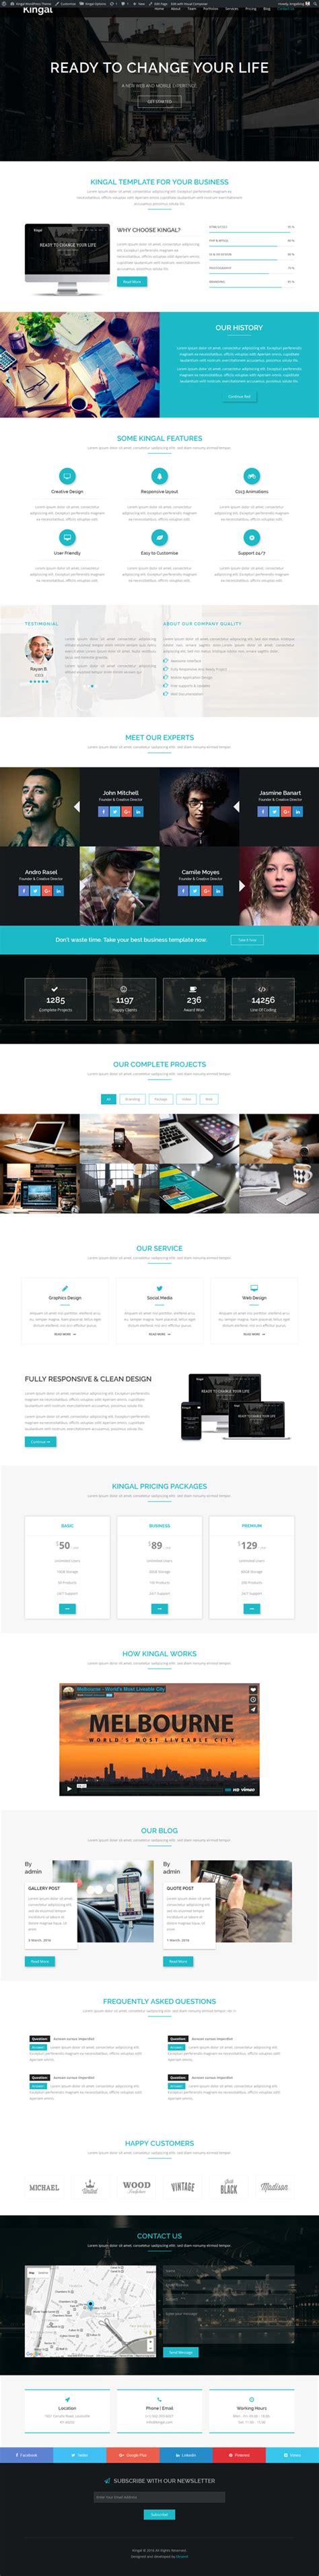 wordpress themes grafik design modern designed responsive wordpress themes wordpress